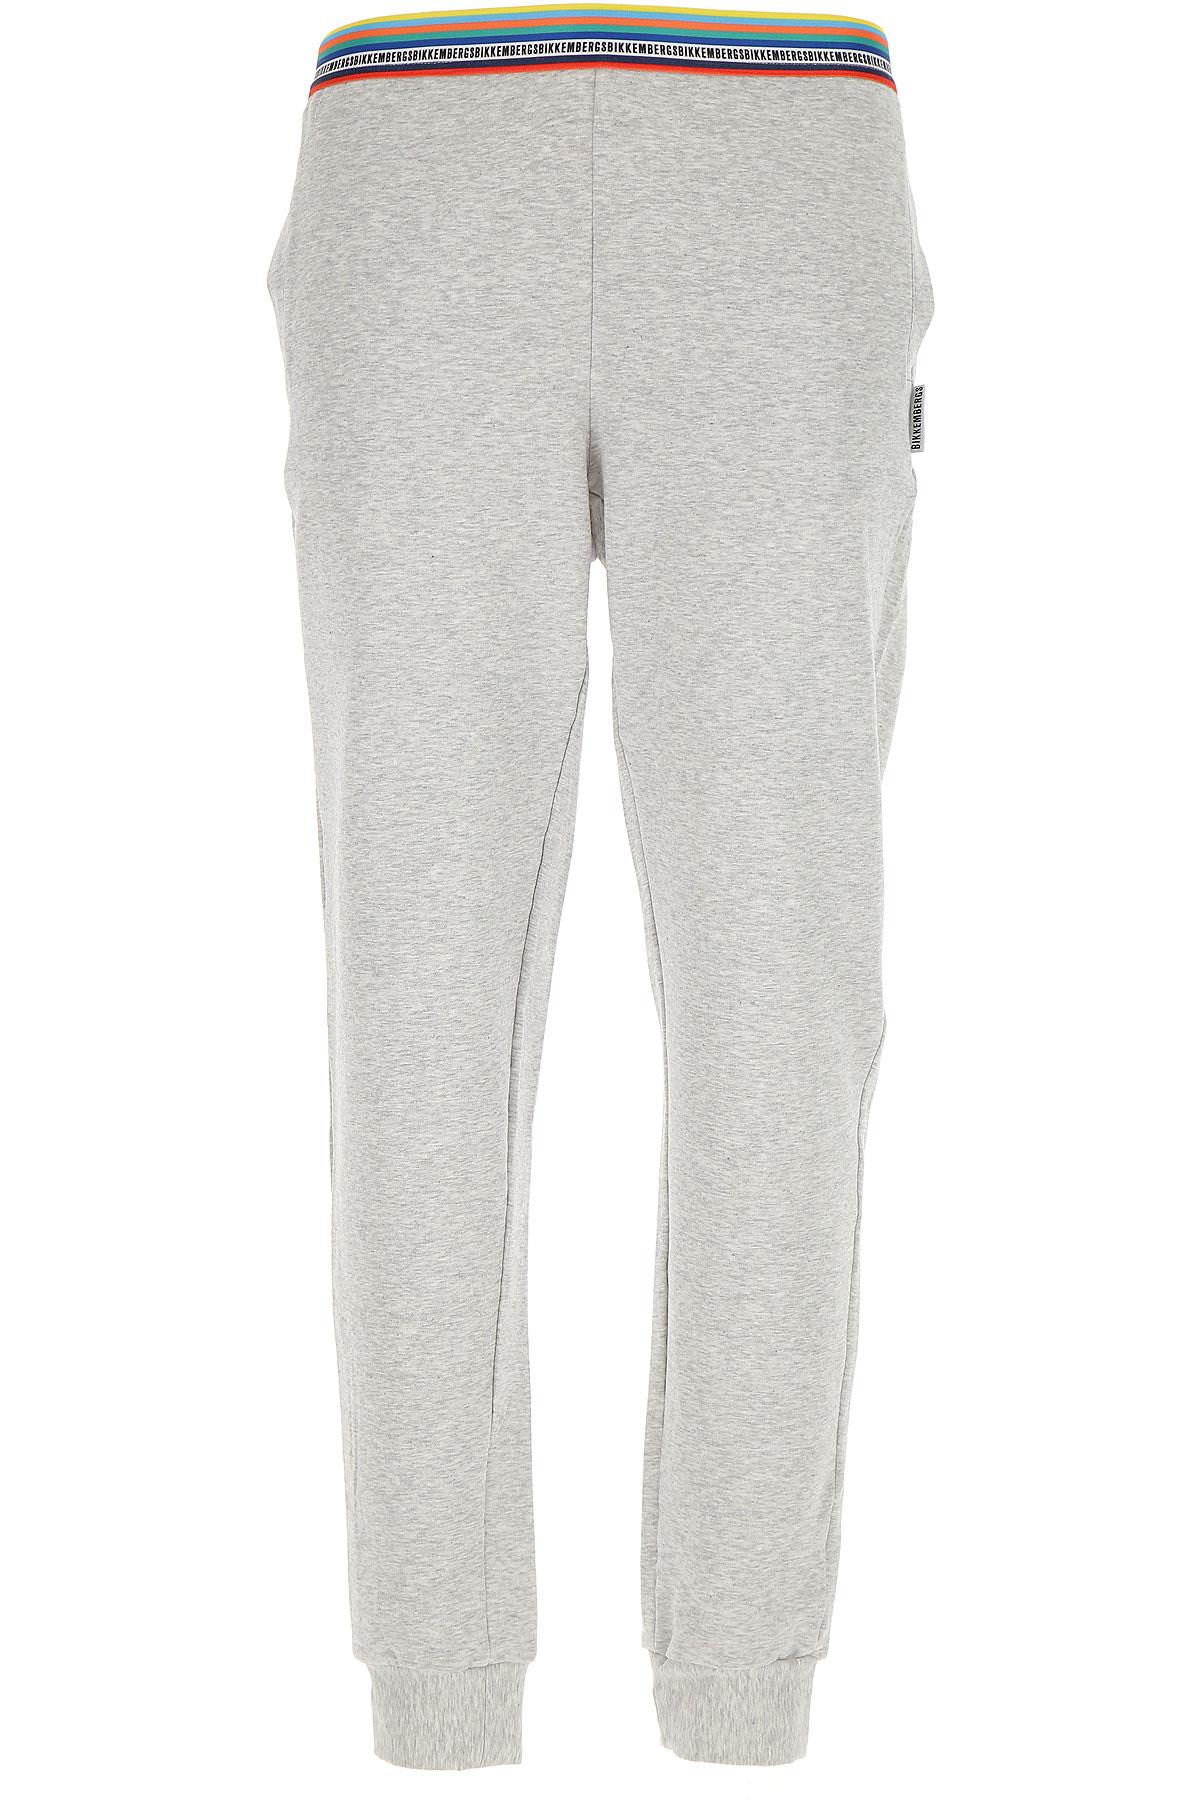 Image of Dirk Bikkembergs Loungewear for Men On Sale, Grey Melange, Cotton, 2017, S (EU 3) L (EU 5) XL (EU 6)